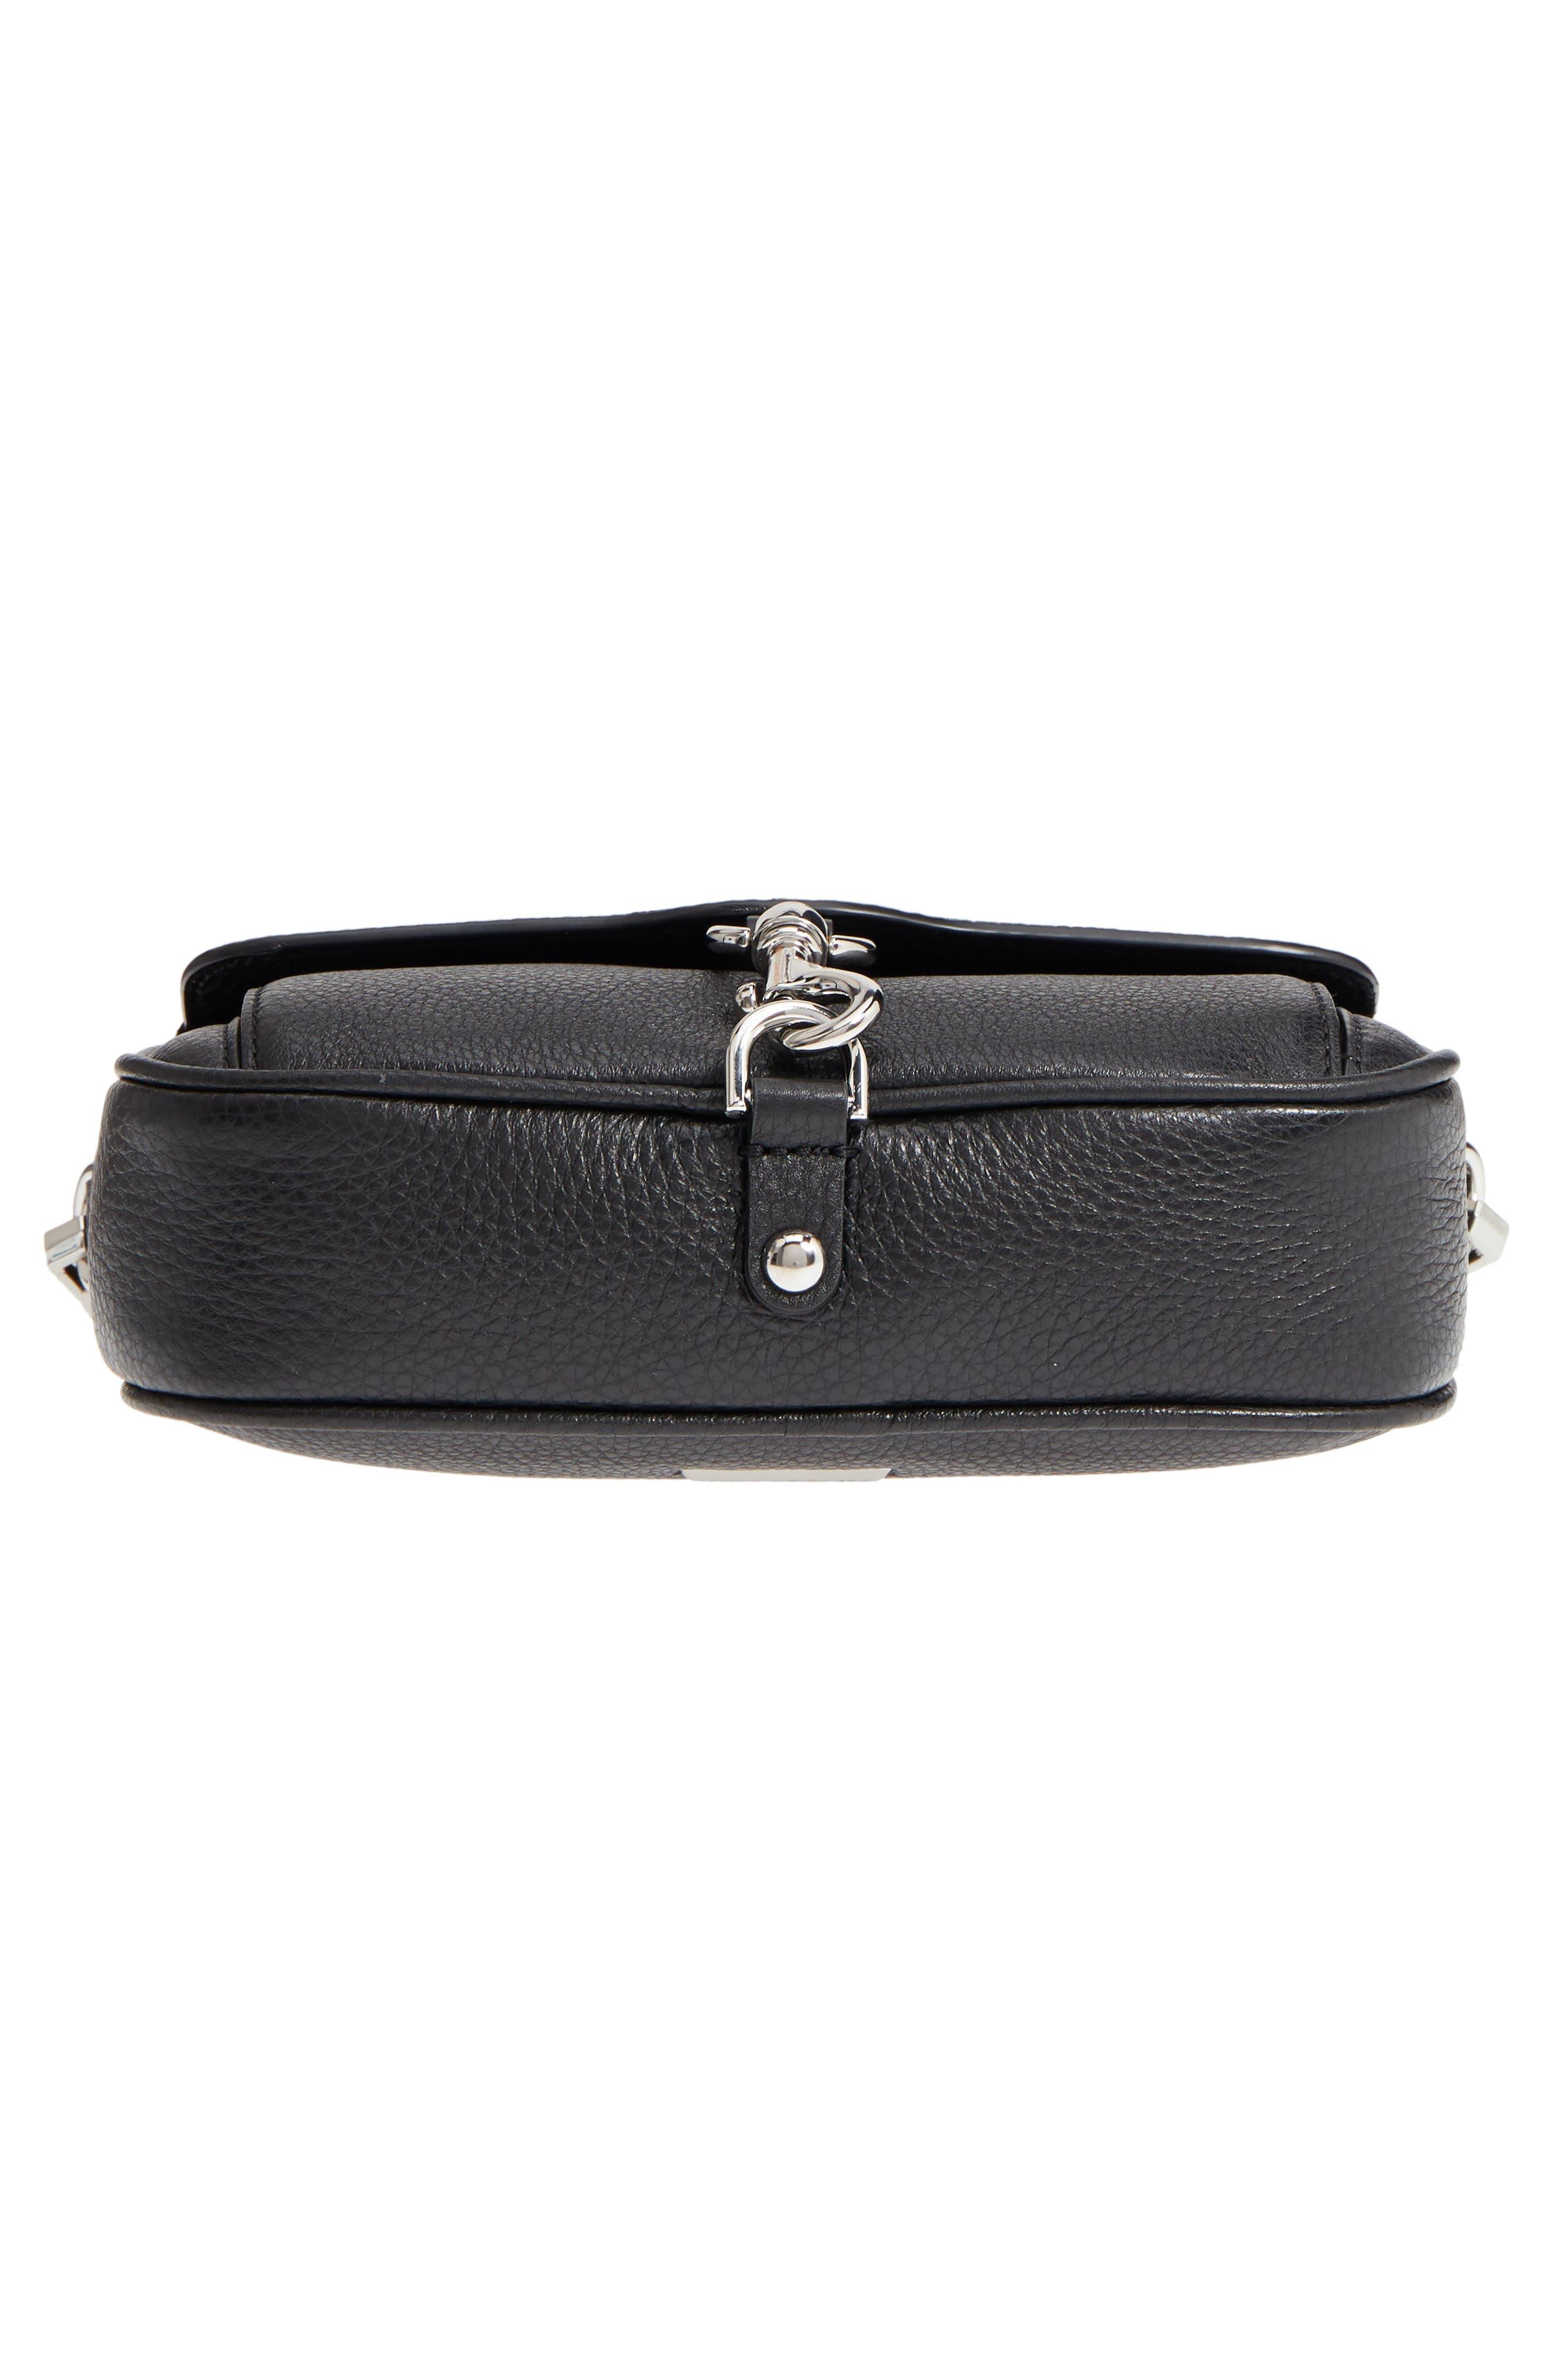 REBECCA MINKOFF,                             Blythe Leather Crossbody Bag,                             Alternate thumbnail 6, color,                             BLACK